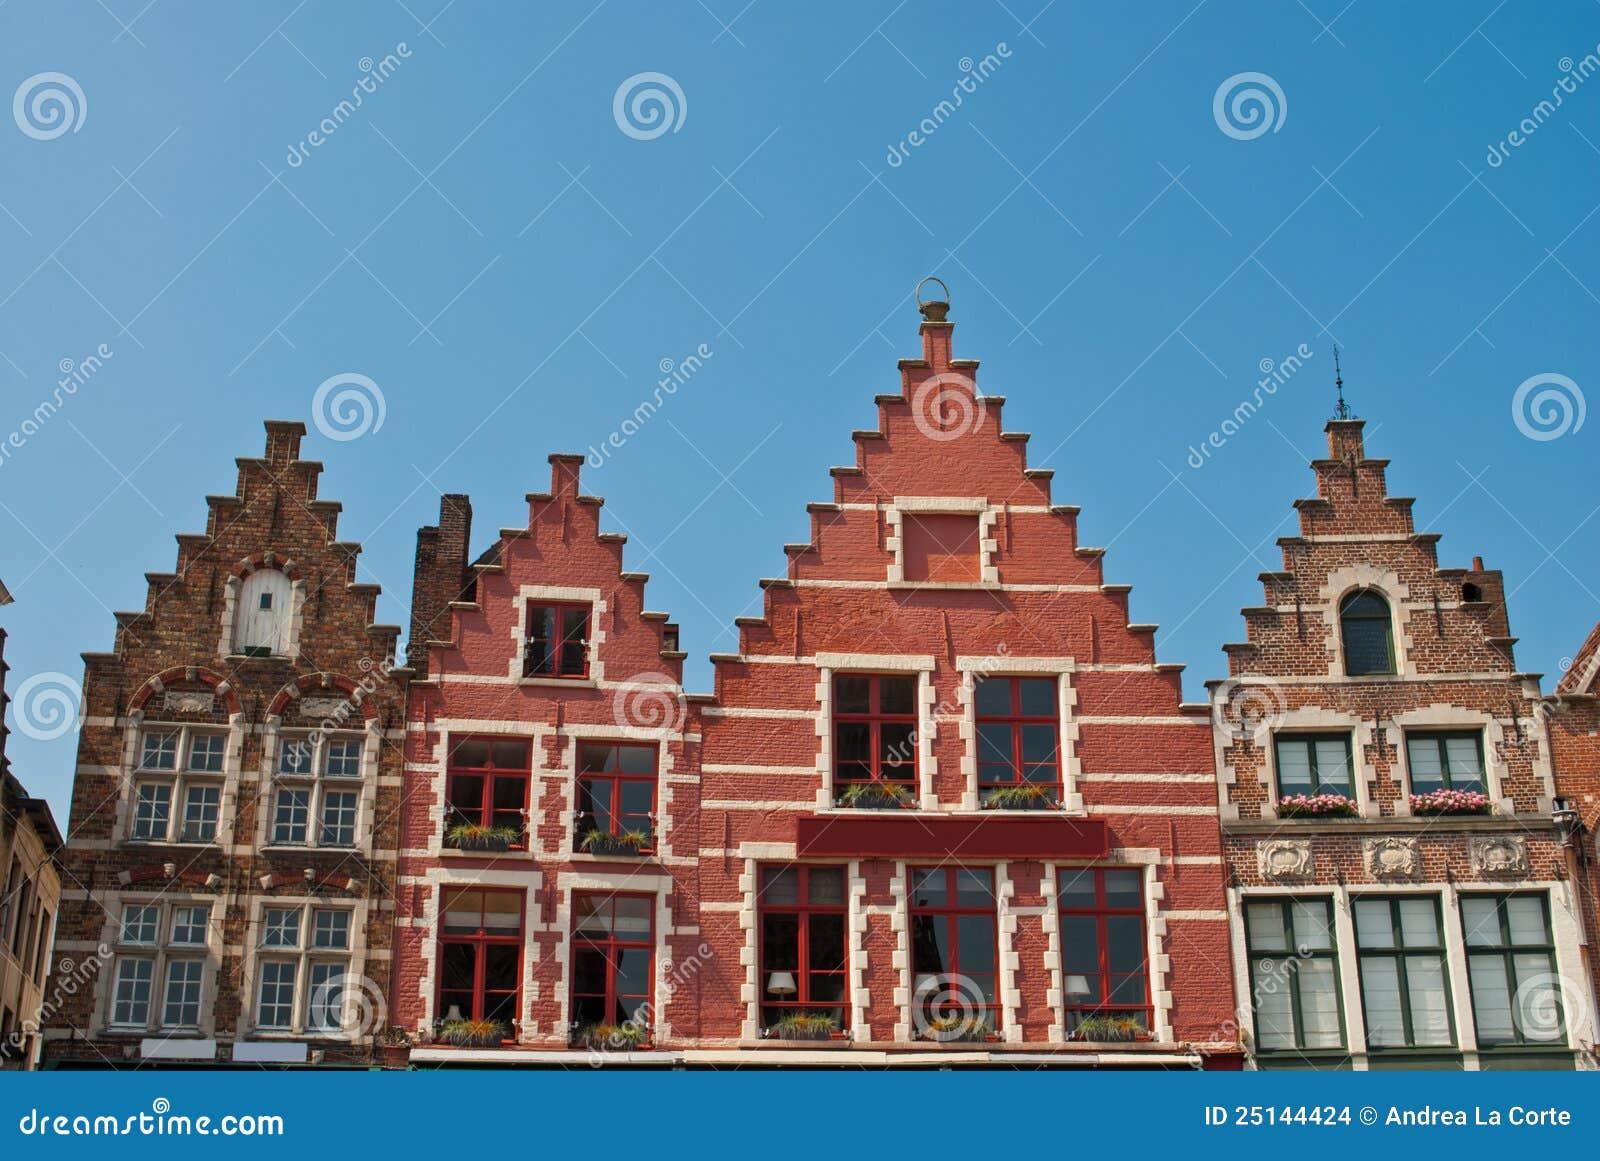 Buildings in Central Square - Bruges